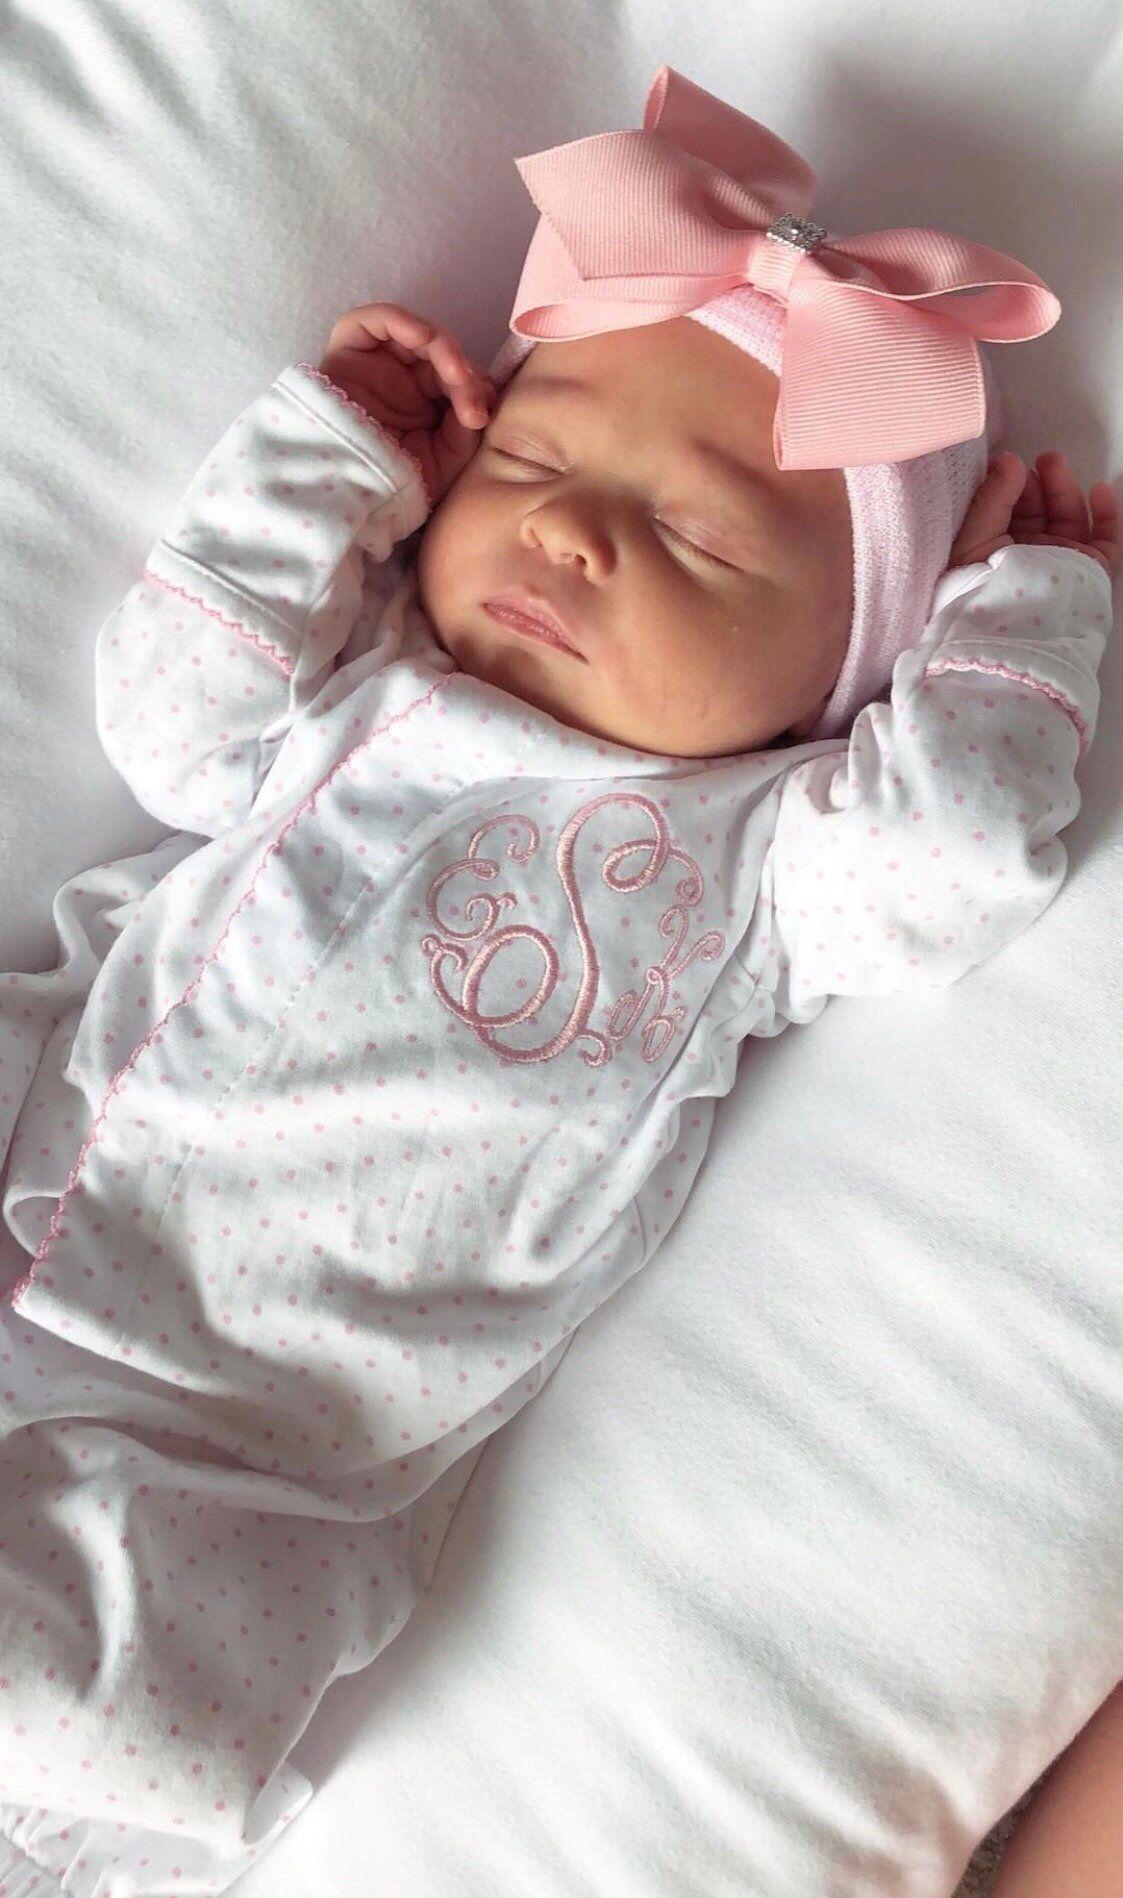 Nursery Time with Tags Tiny Baby Reborn Premature Preemie Girls Pretty just Like Mummy Dress Set